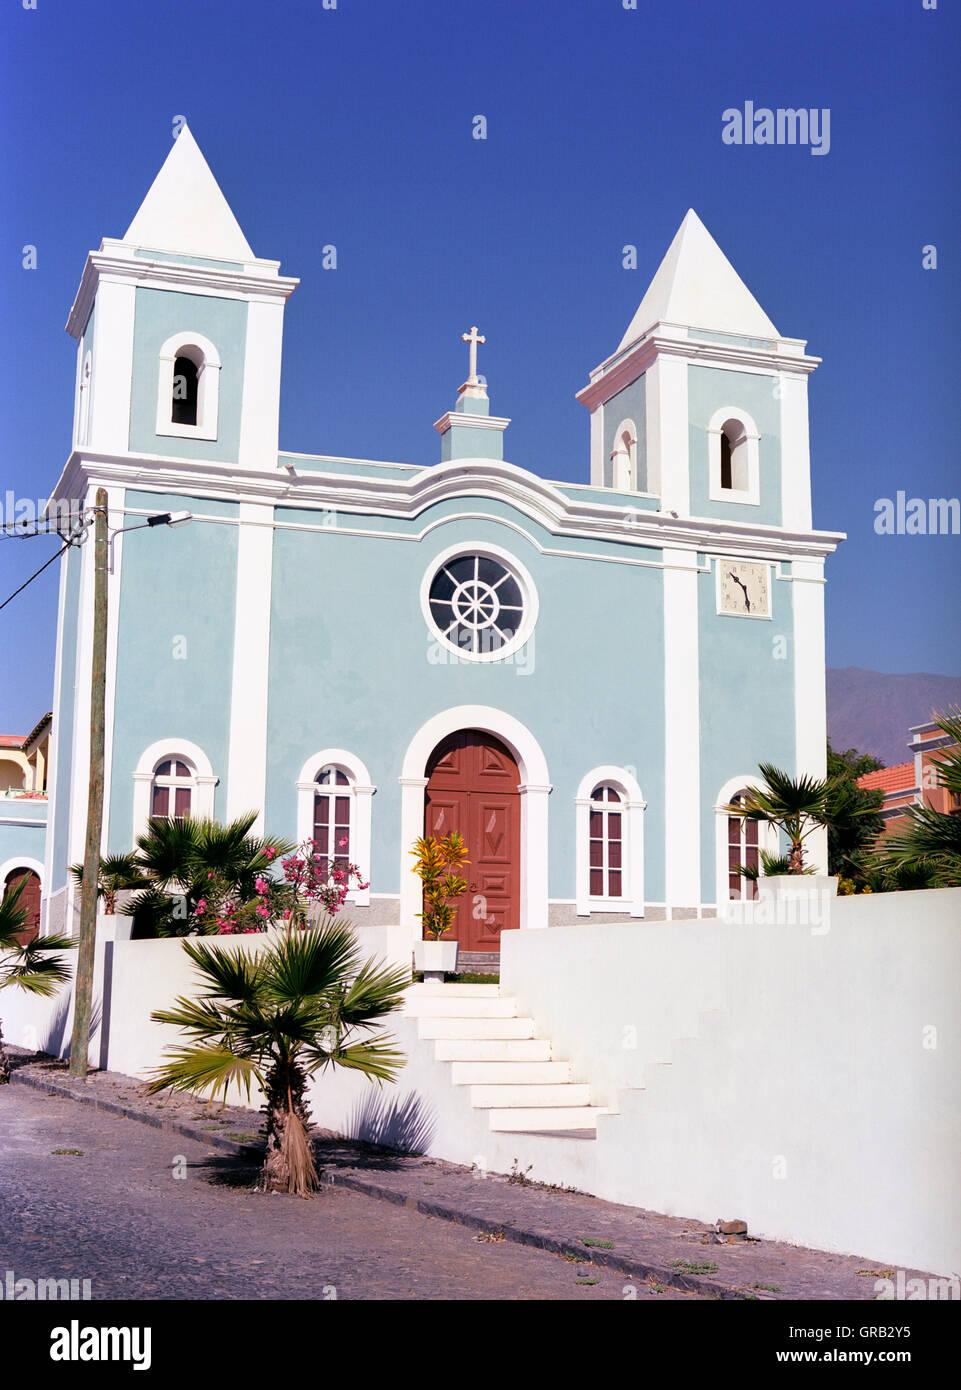 La iglesia local, San Felipe, Fogo, Islas de Cabo Verde, África Imagen De Stock